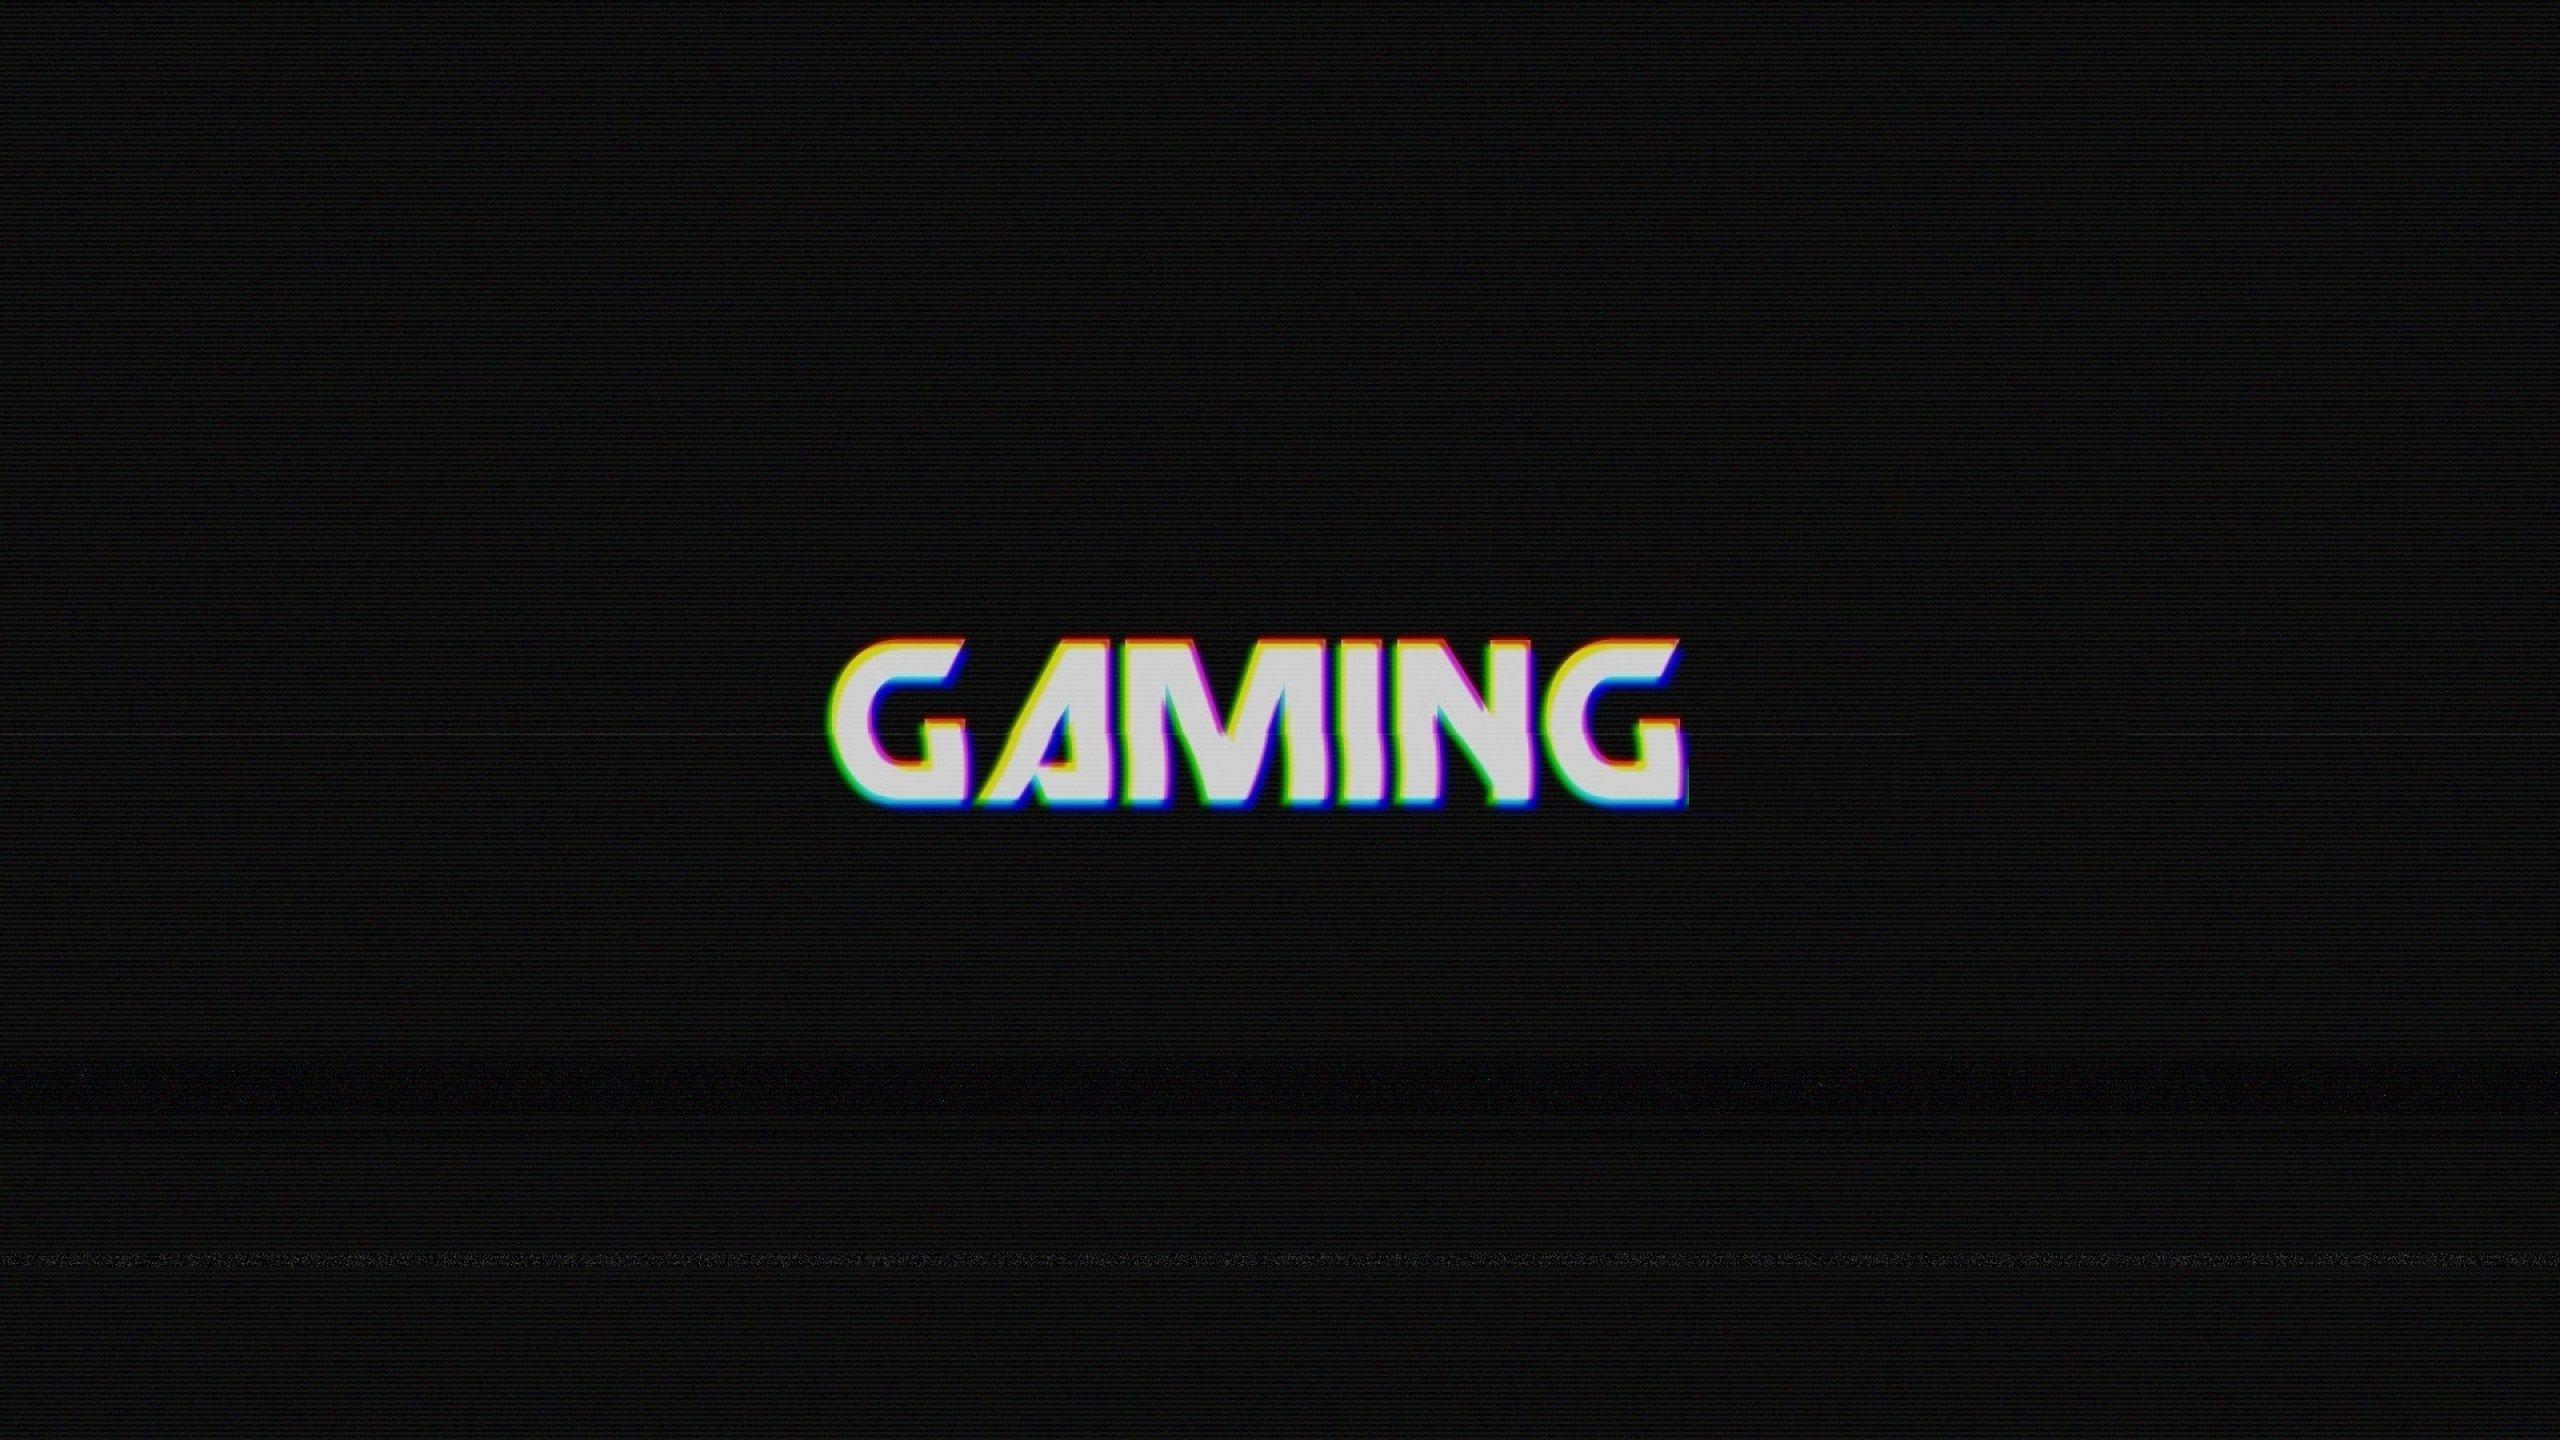 Gaming logo wallpapers wallpaper cave - Gaming logo wallpaper ...